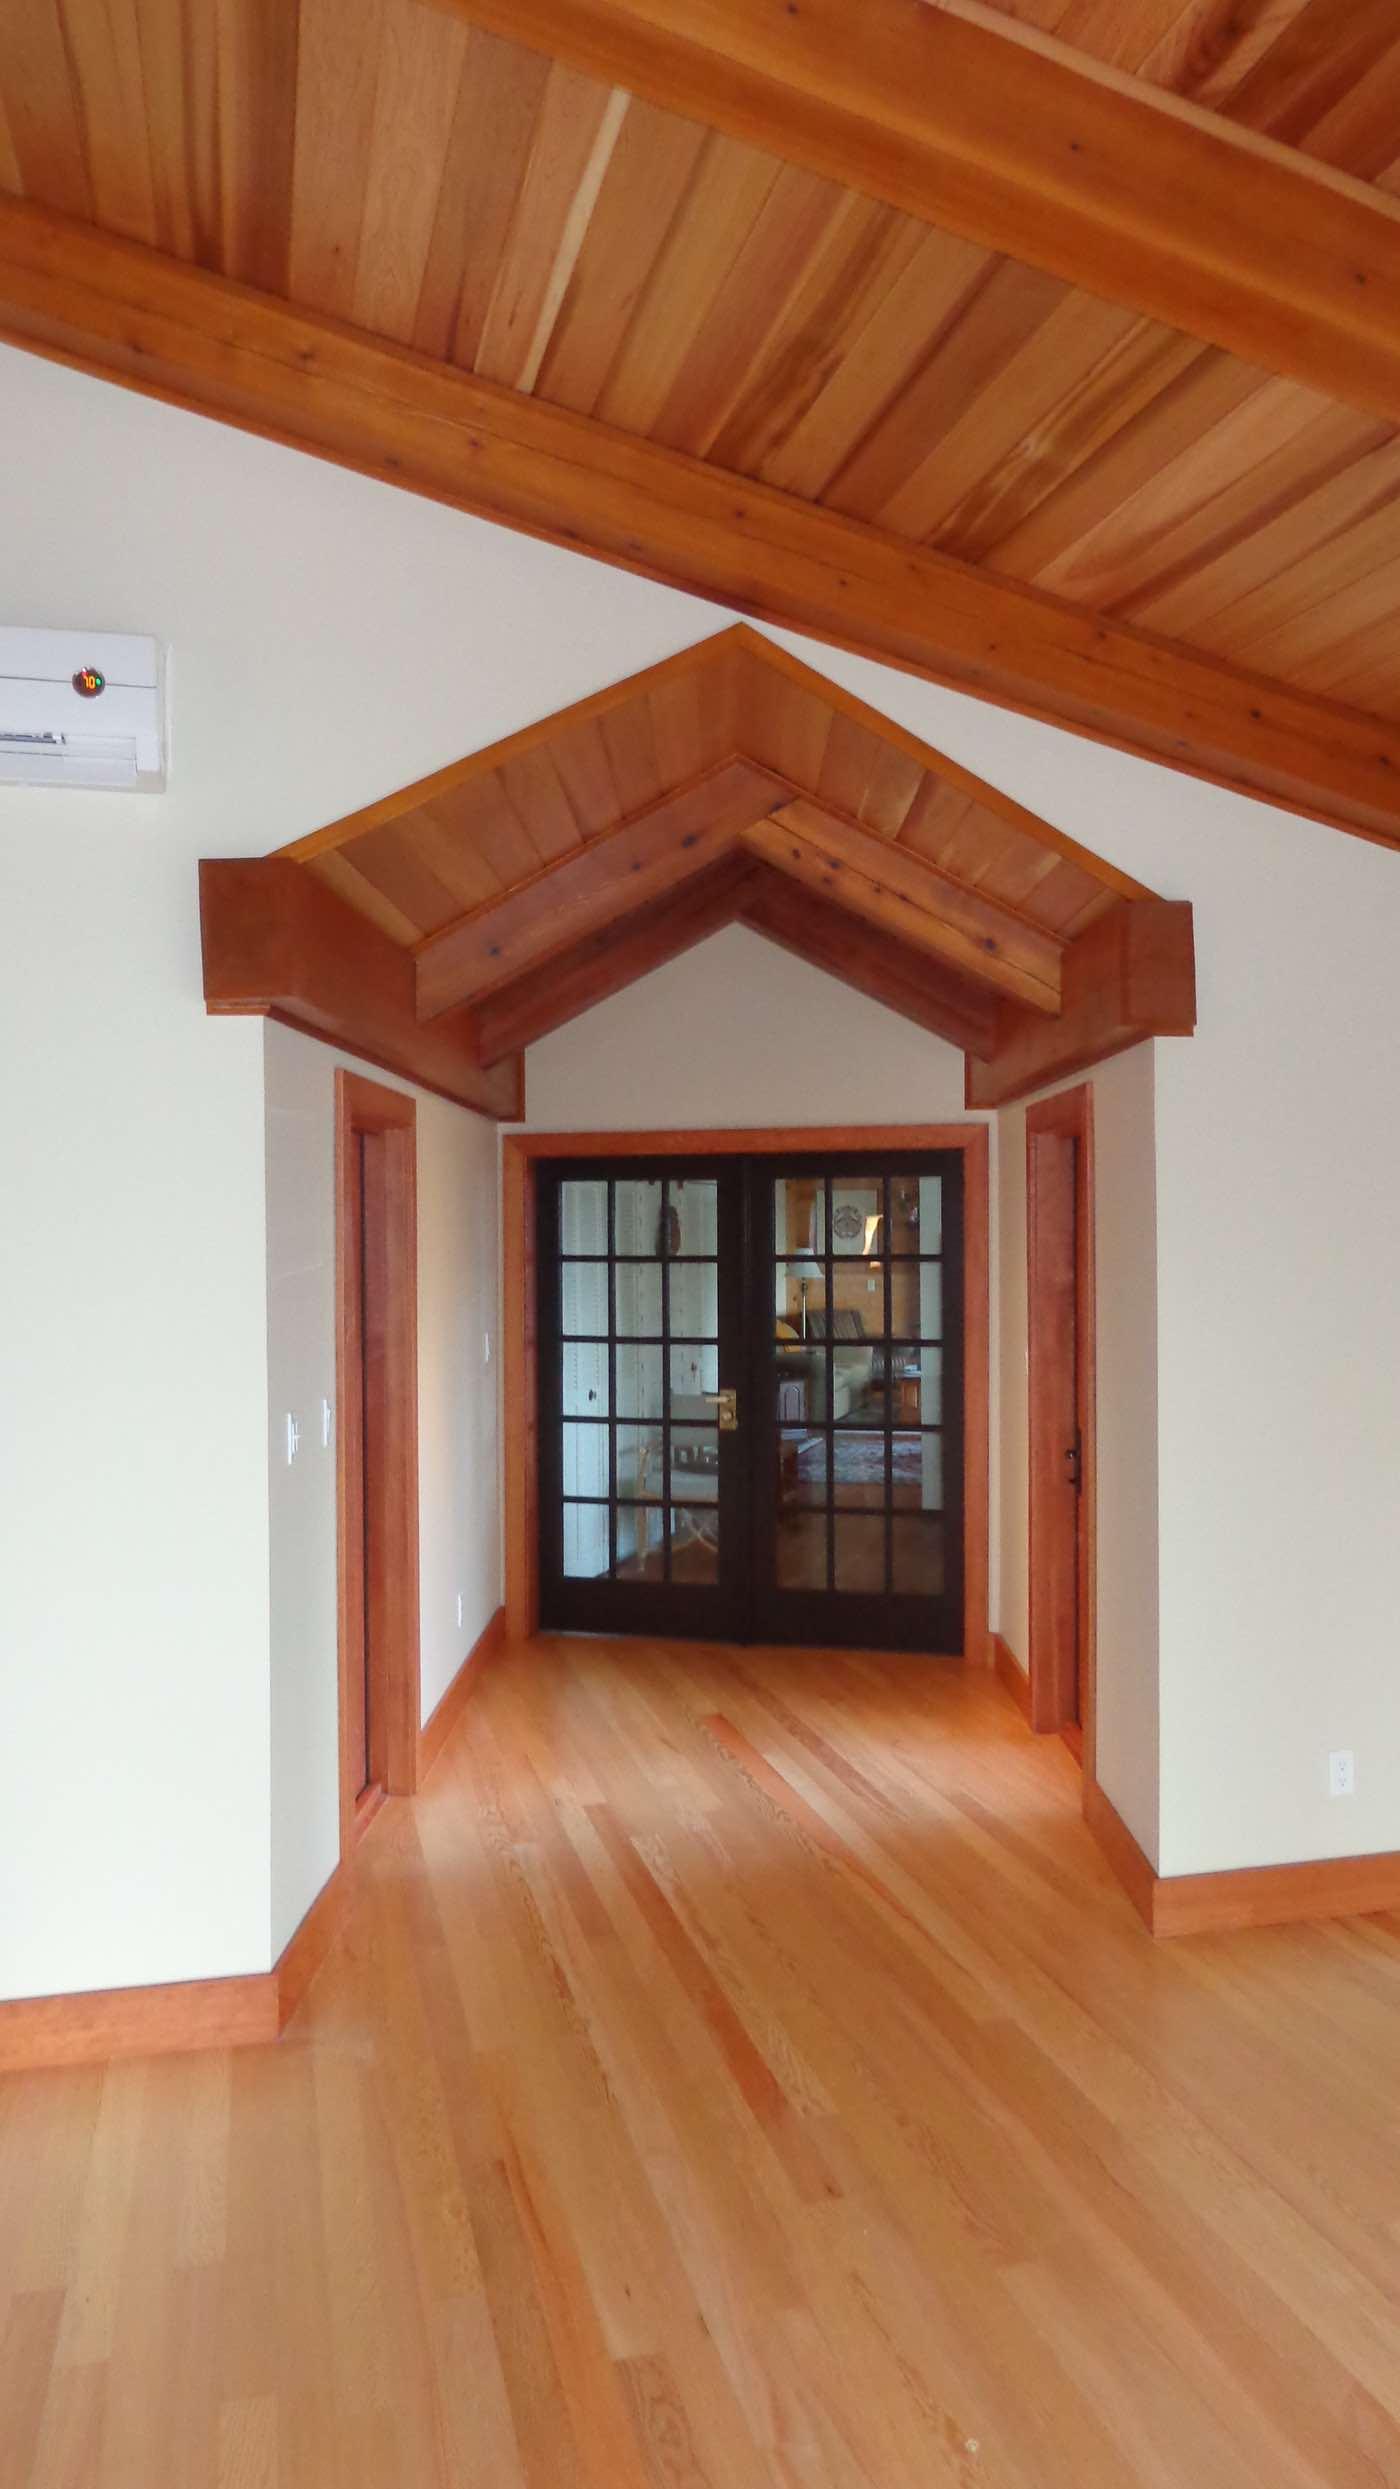 fine wood working in custom home by Copper Ridge Homes